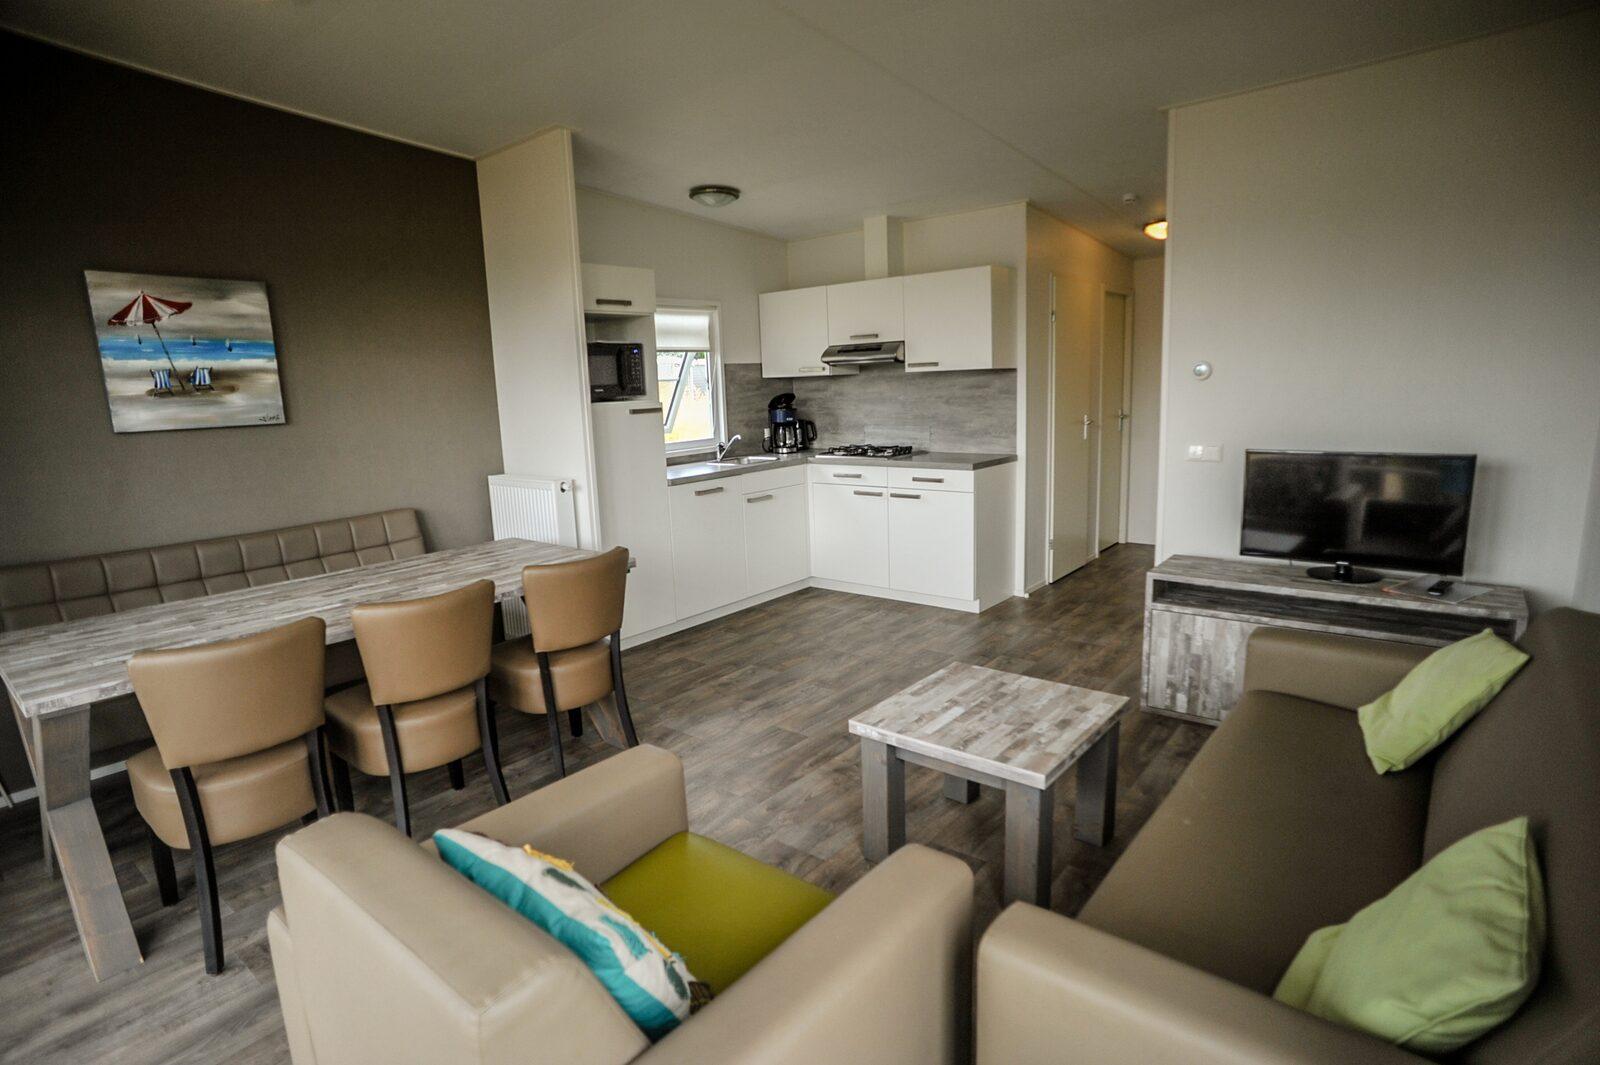 Lodge confort | 6 personnes (50 m²) | chiens admis